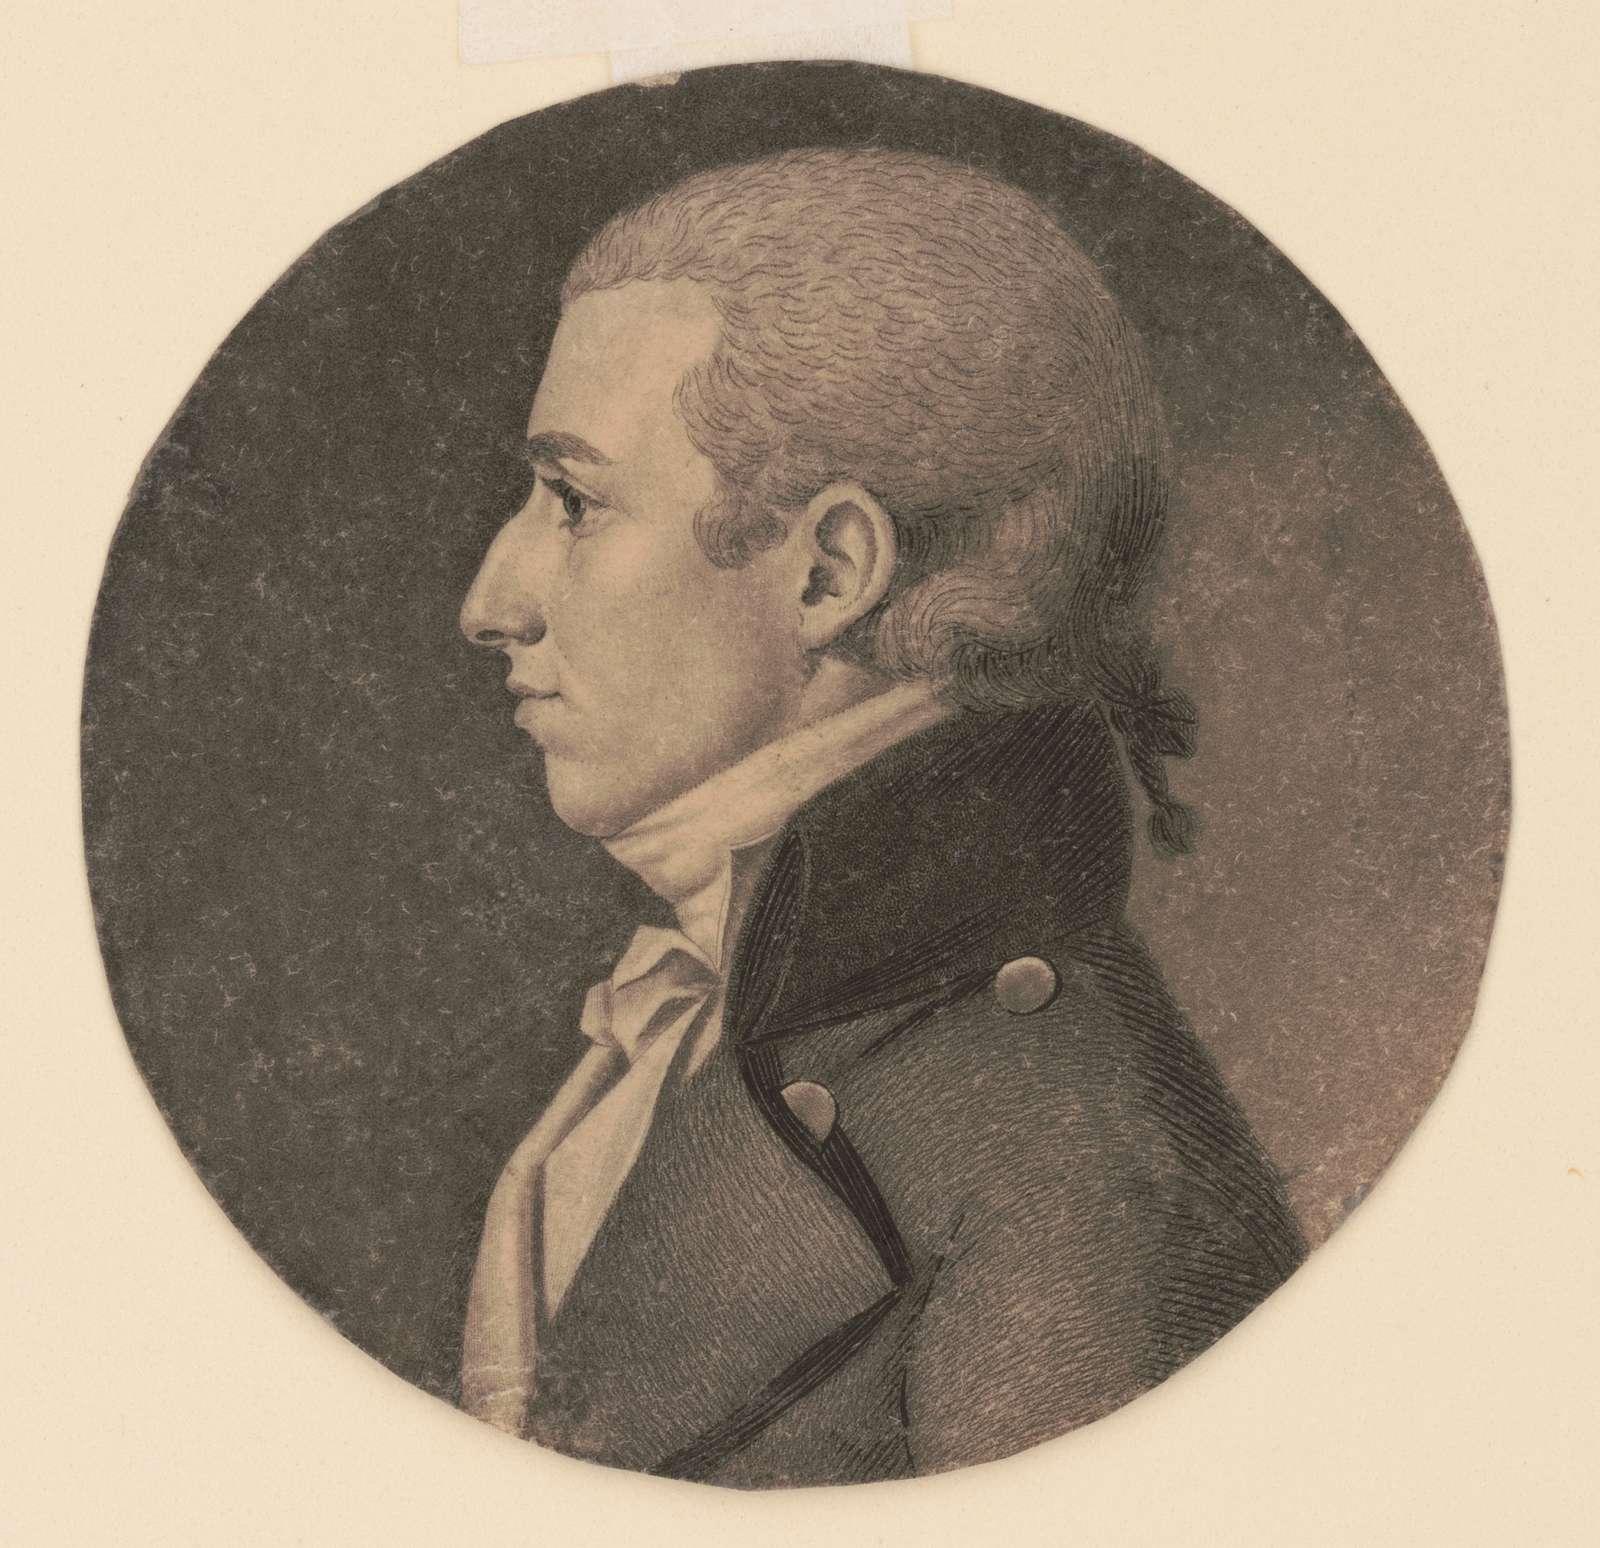 John Cuthbert, head-and-shoulders portrait, left profile